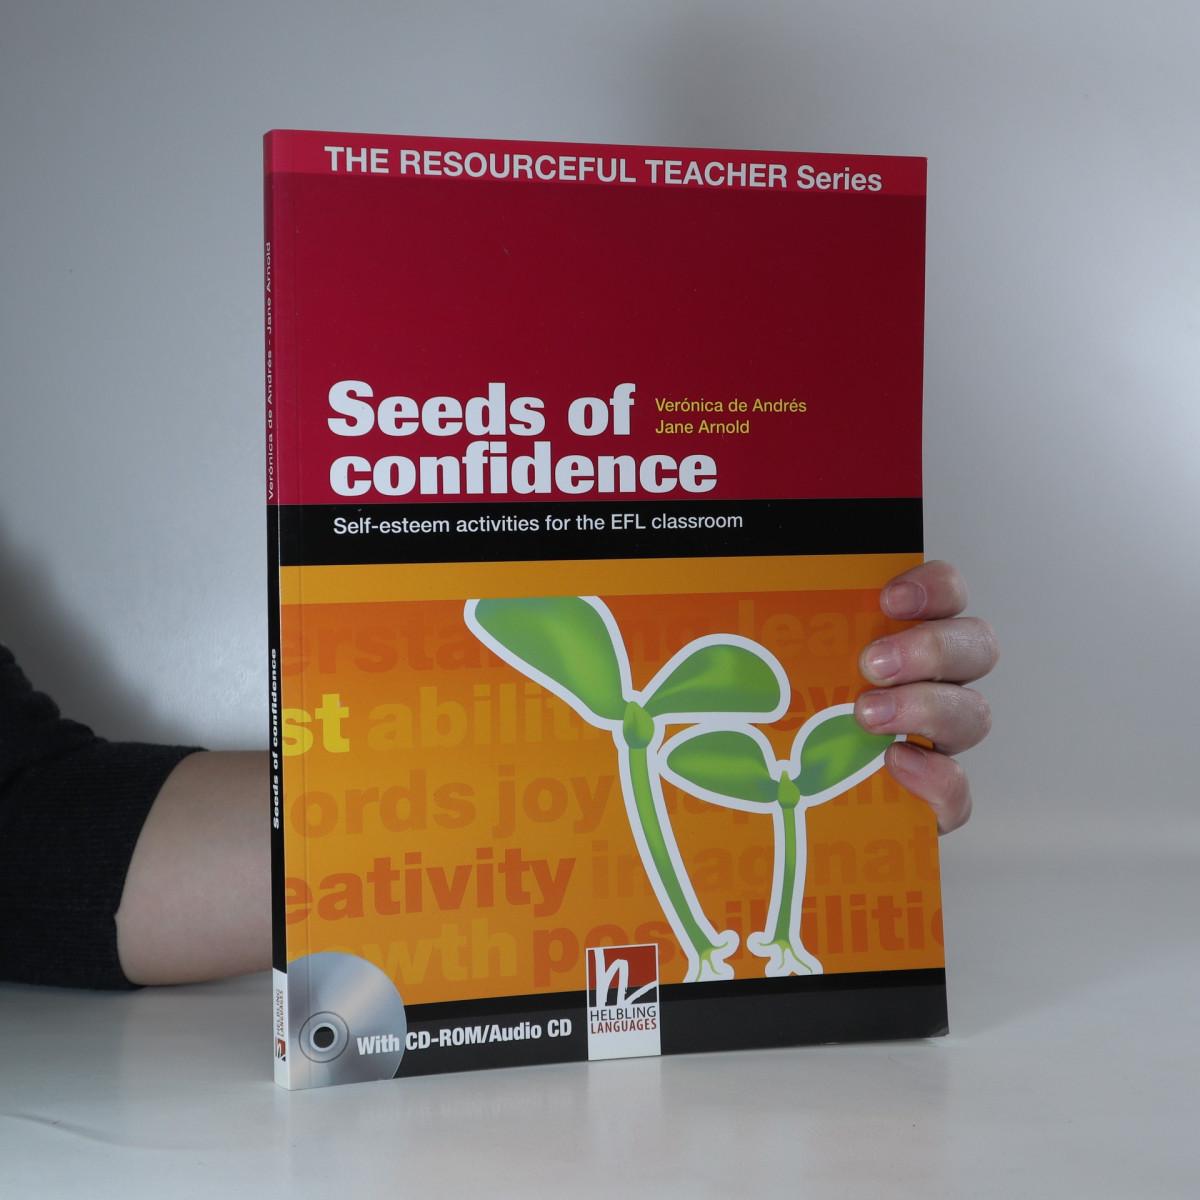 antikvární kniha Seeds of confidence : self-esteem activities for the EFL classroom, 2009